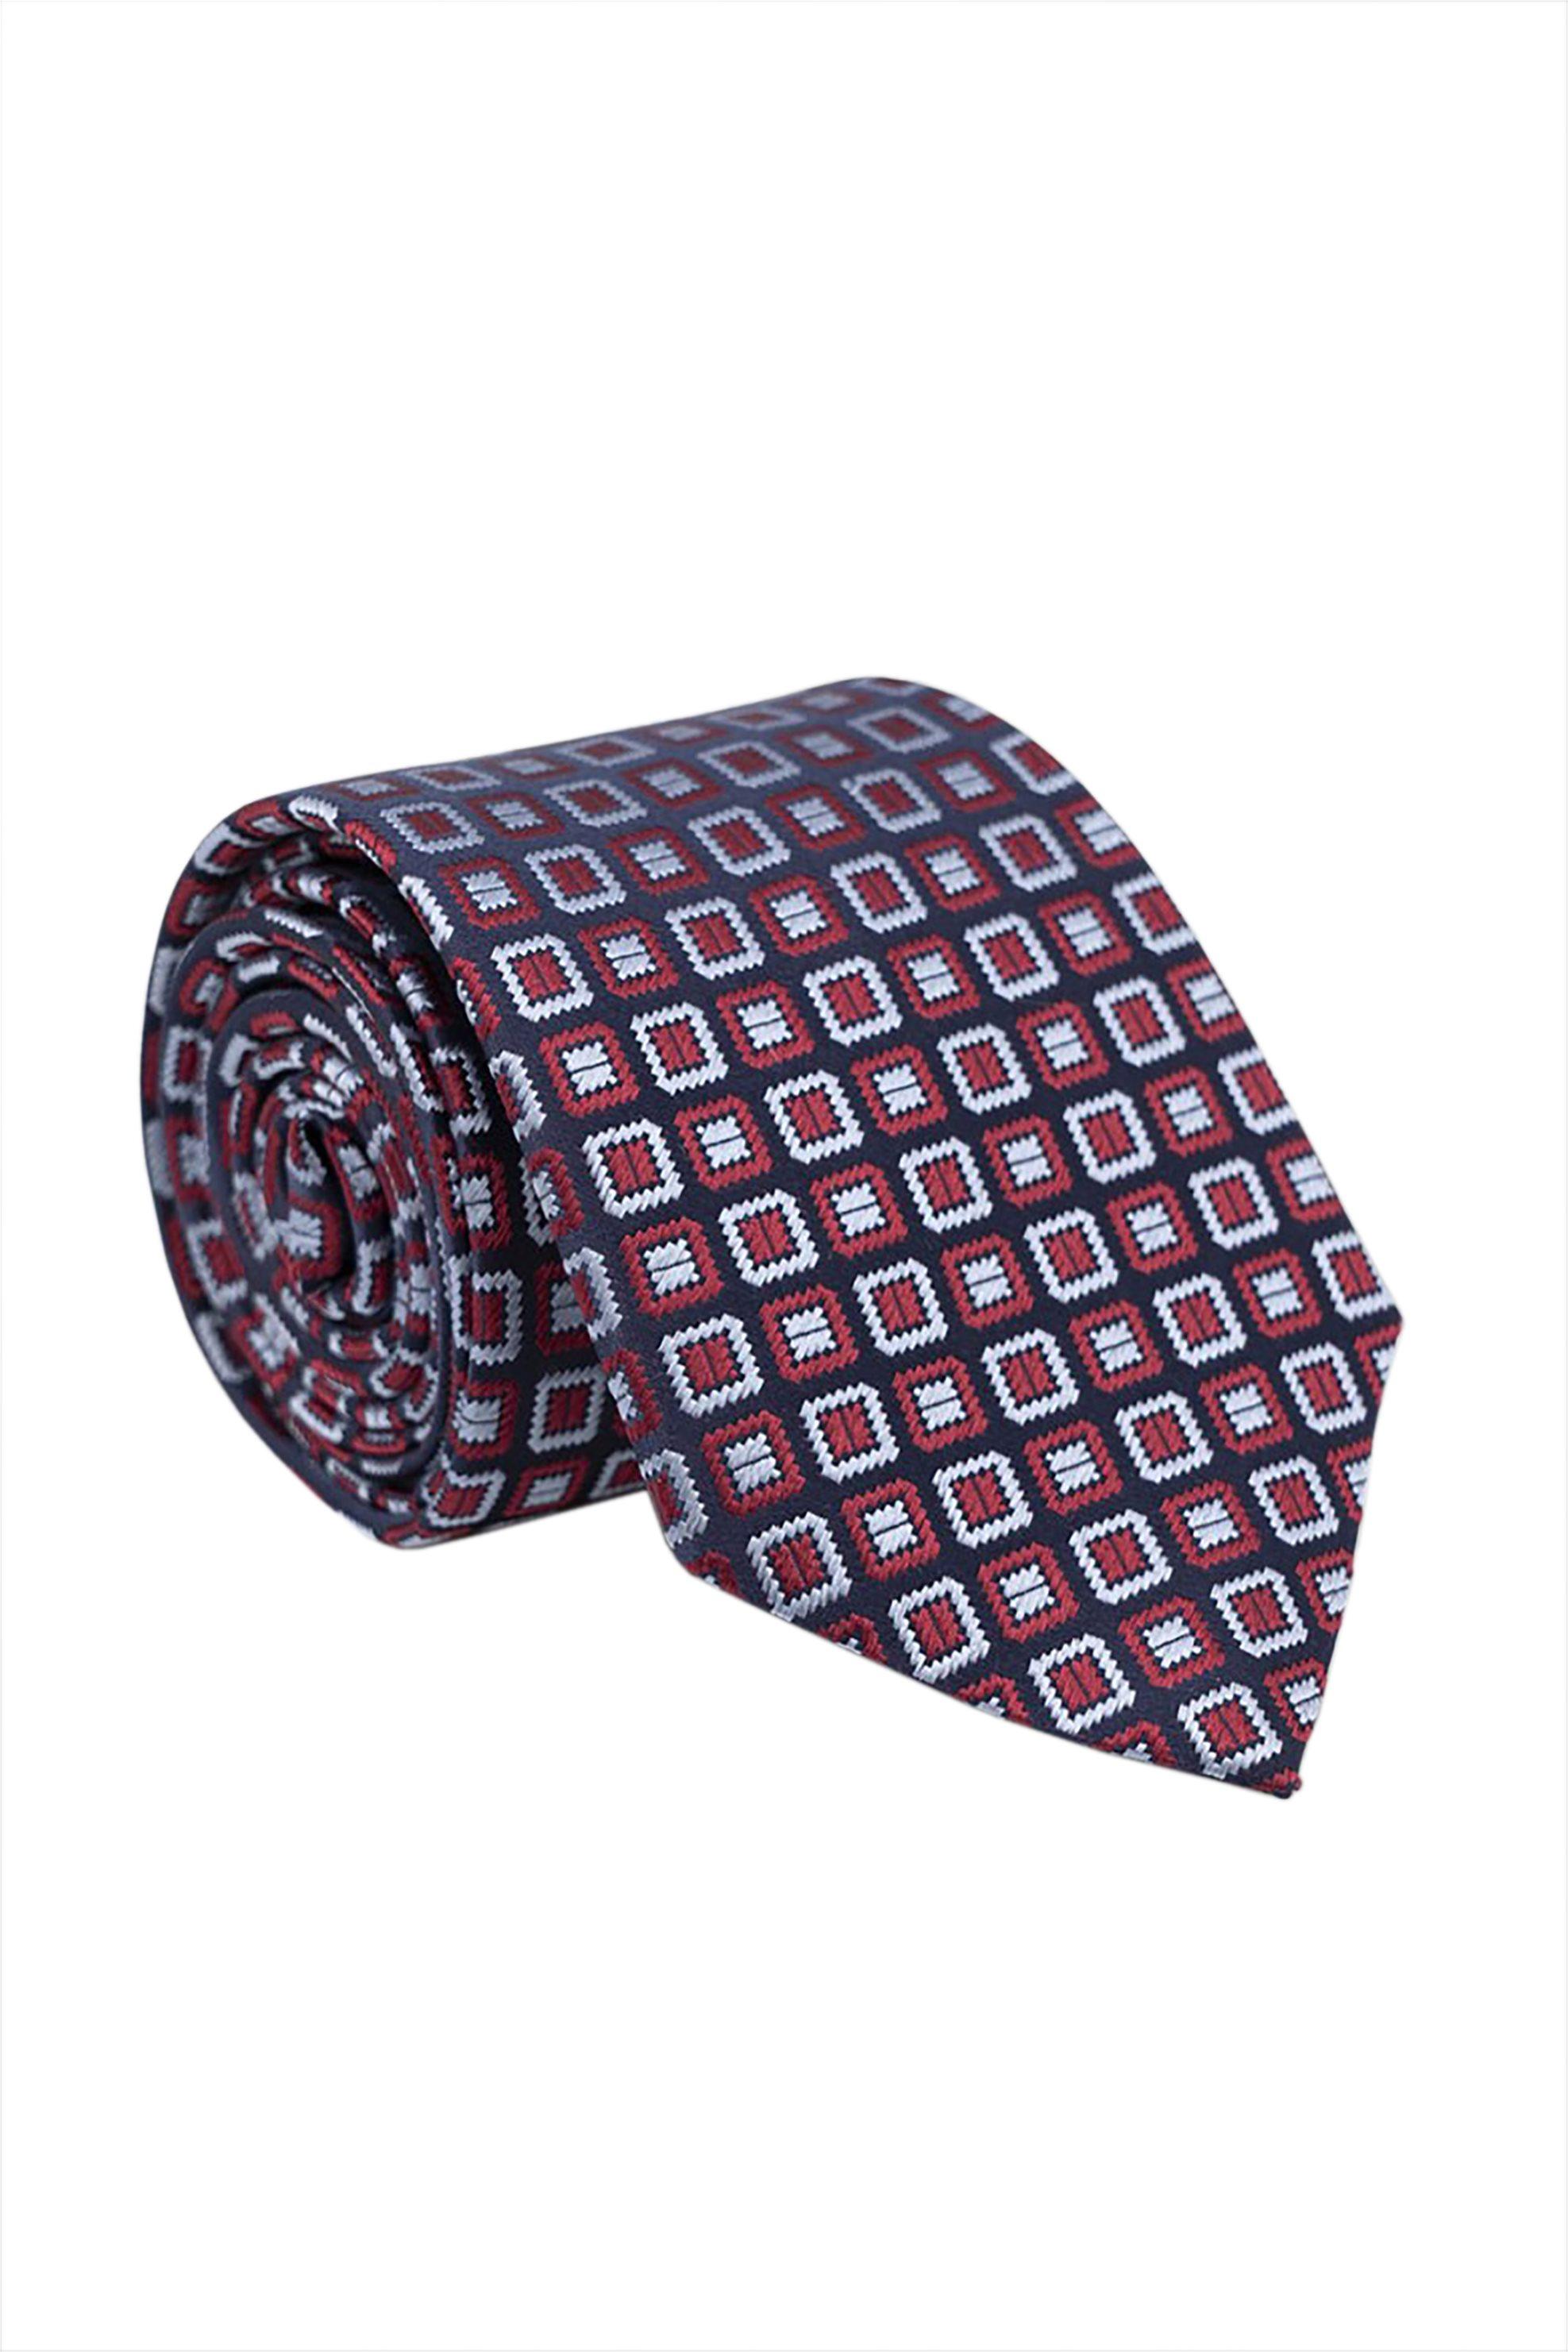 Oxford Company ανδρική μεταξωτή γραβάτα με μικροσχέδιο - TIE51-407.01 - Κόκκινο